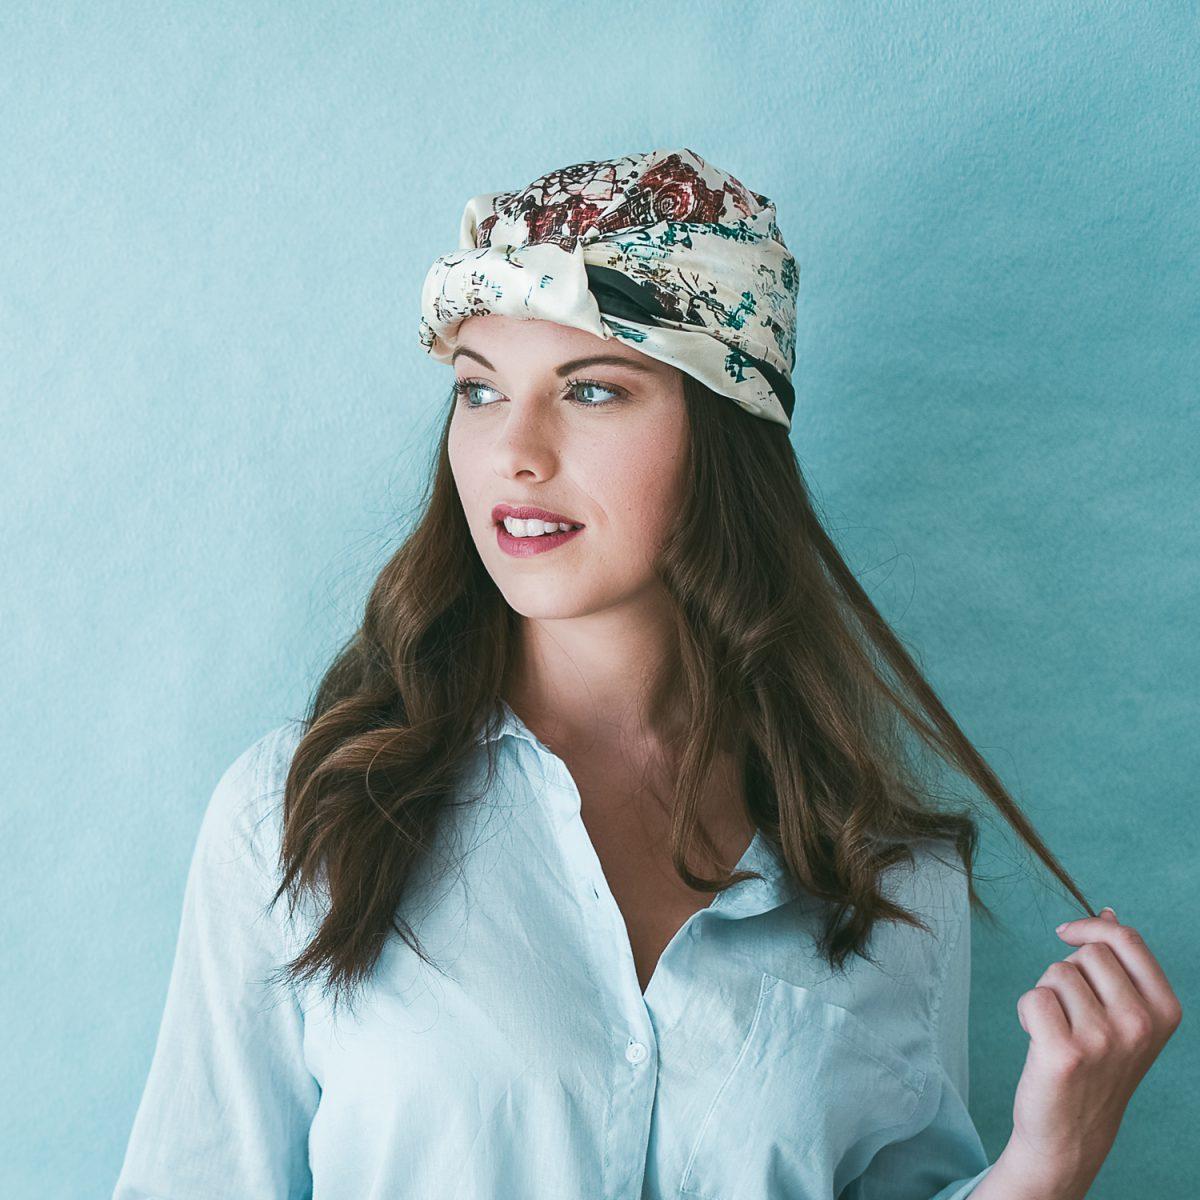 Âmulet Foulard ATLAS Oasis fashion headwrapped style